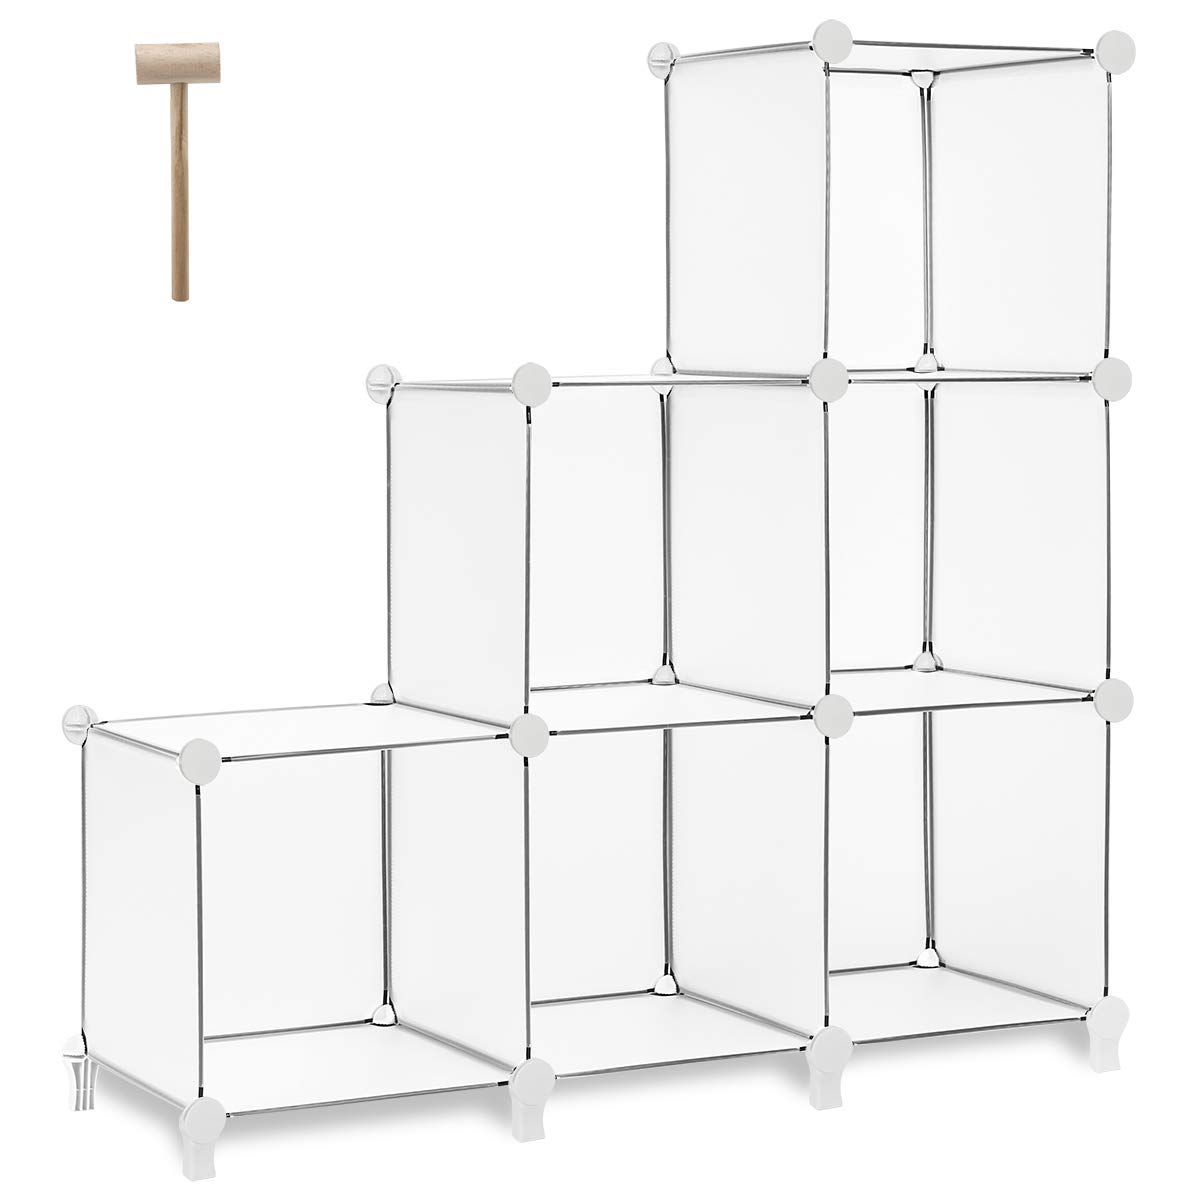 TomCare Cube Storage 6-Cube Bookshelf Closet Organizer Storage Shelves Shelf Cubes Organizer Plastic Square Book Shelf Bookcase DIY Closet Cabinet Organizer Shelving for Home Office Bedroom, White by TomCare